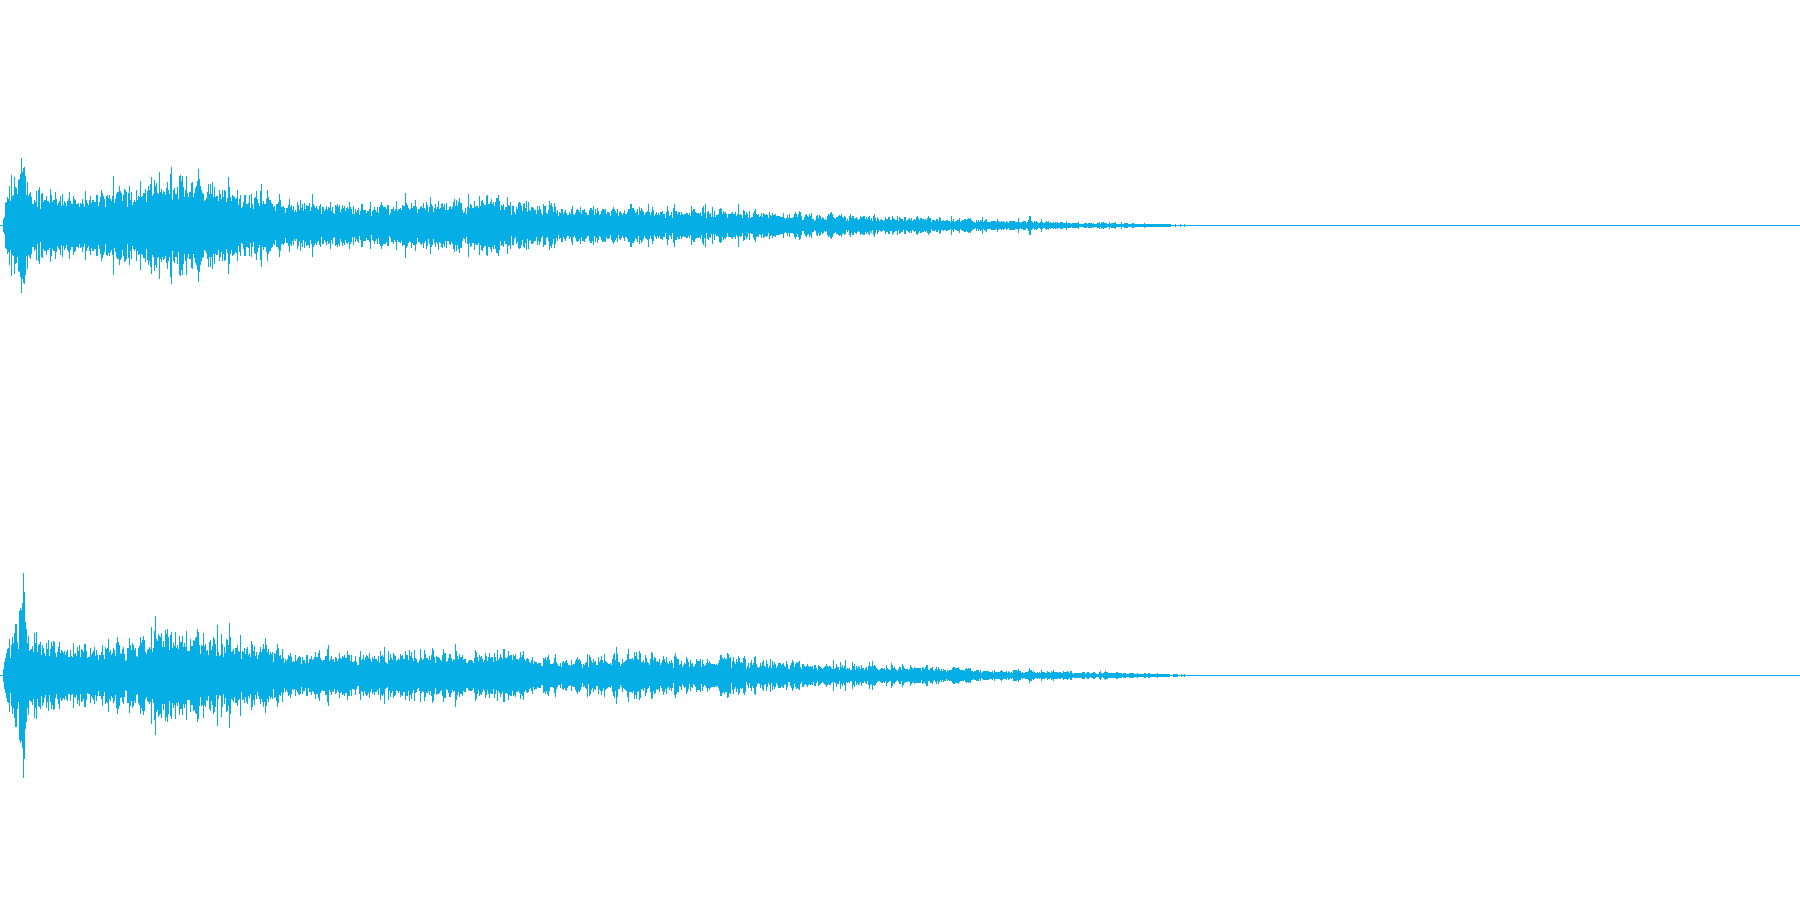 G♯メジャー インパクト音 衝撃音の再生済みの波形